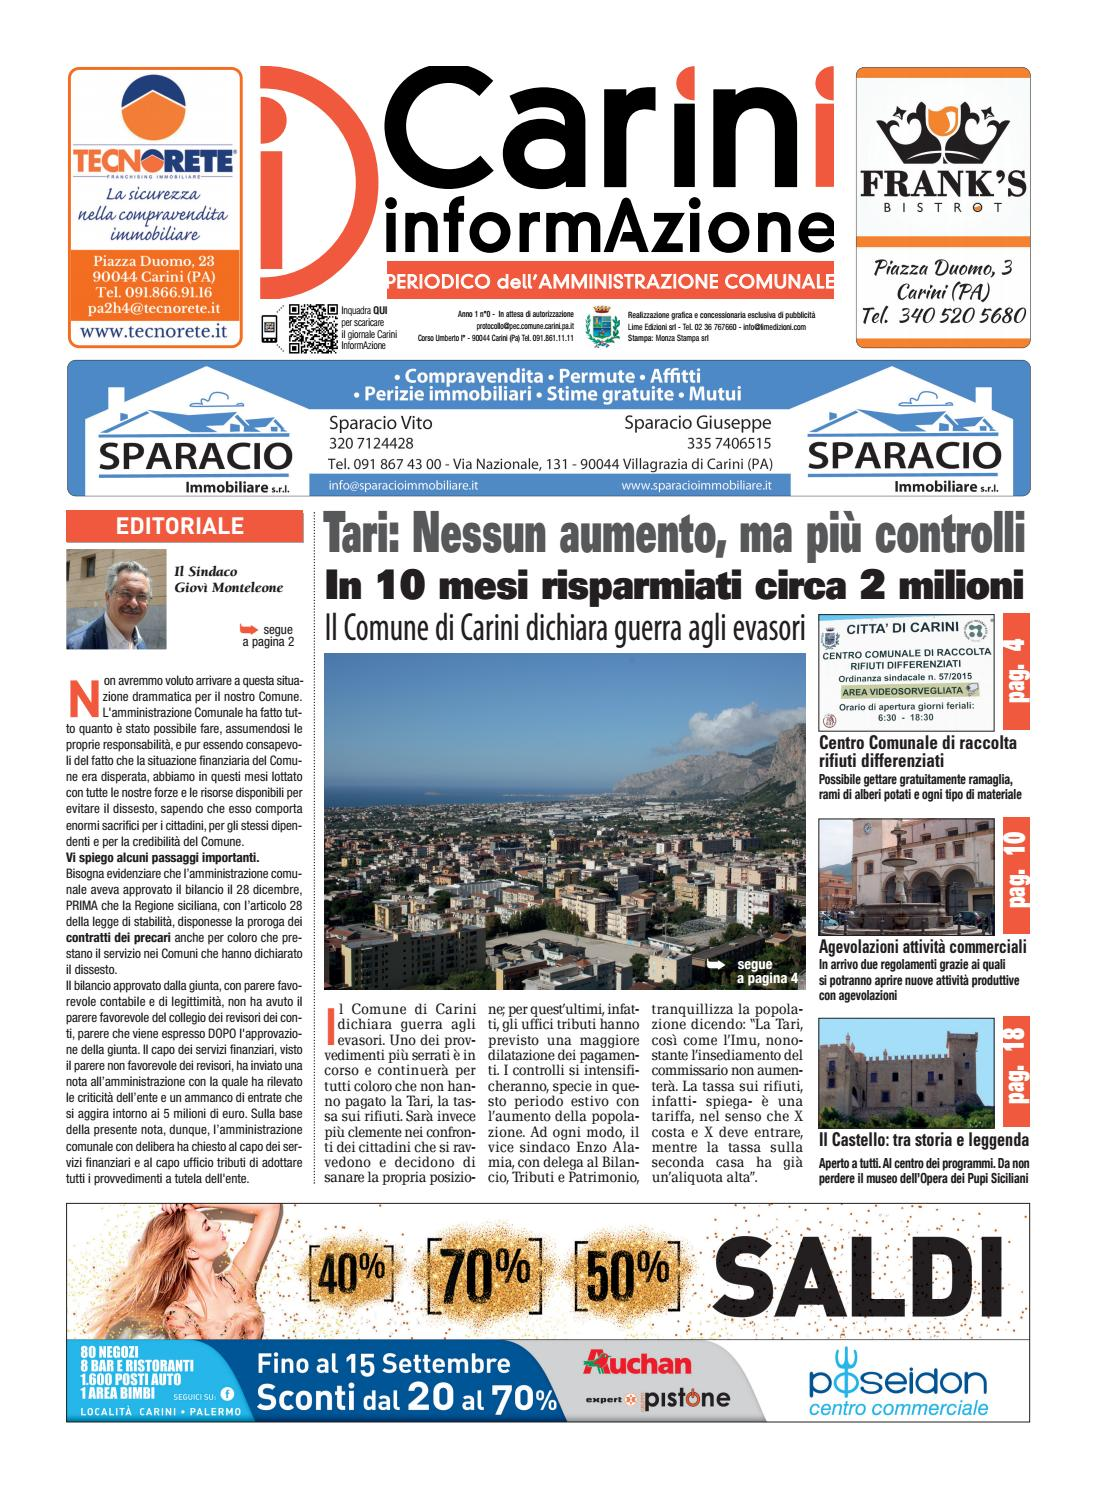 Carini giornale giugno 2016 Lime Edizioni by Lime Edizioni srl - issuu 13fb328ab9b2